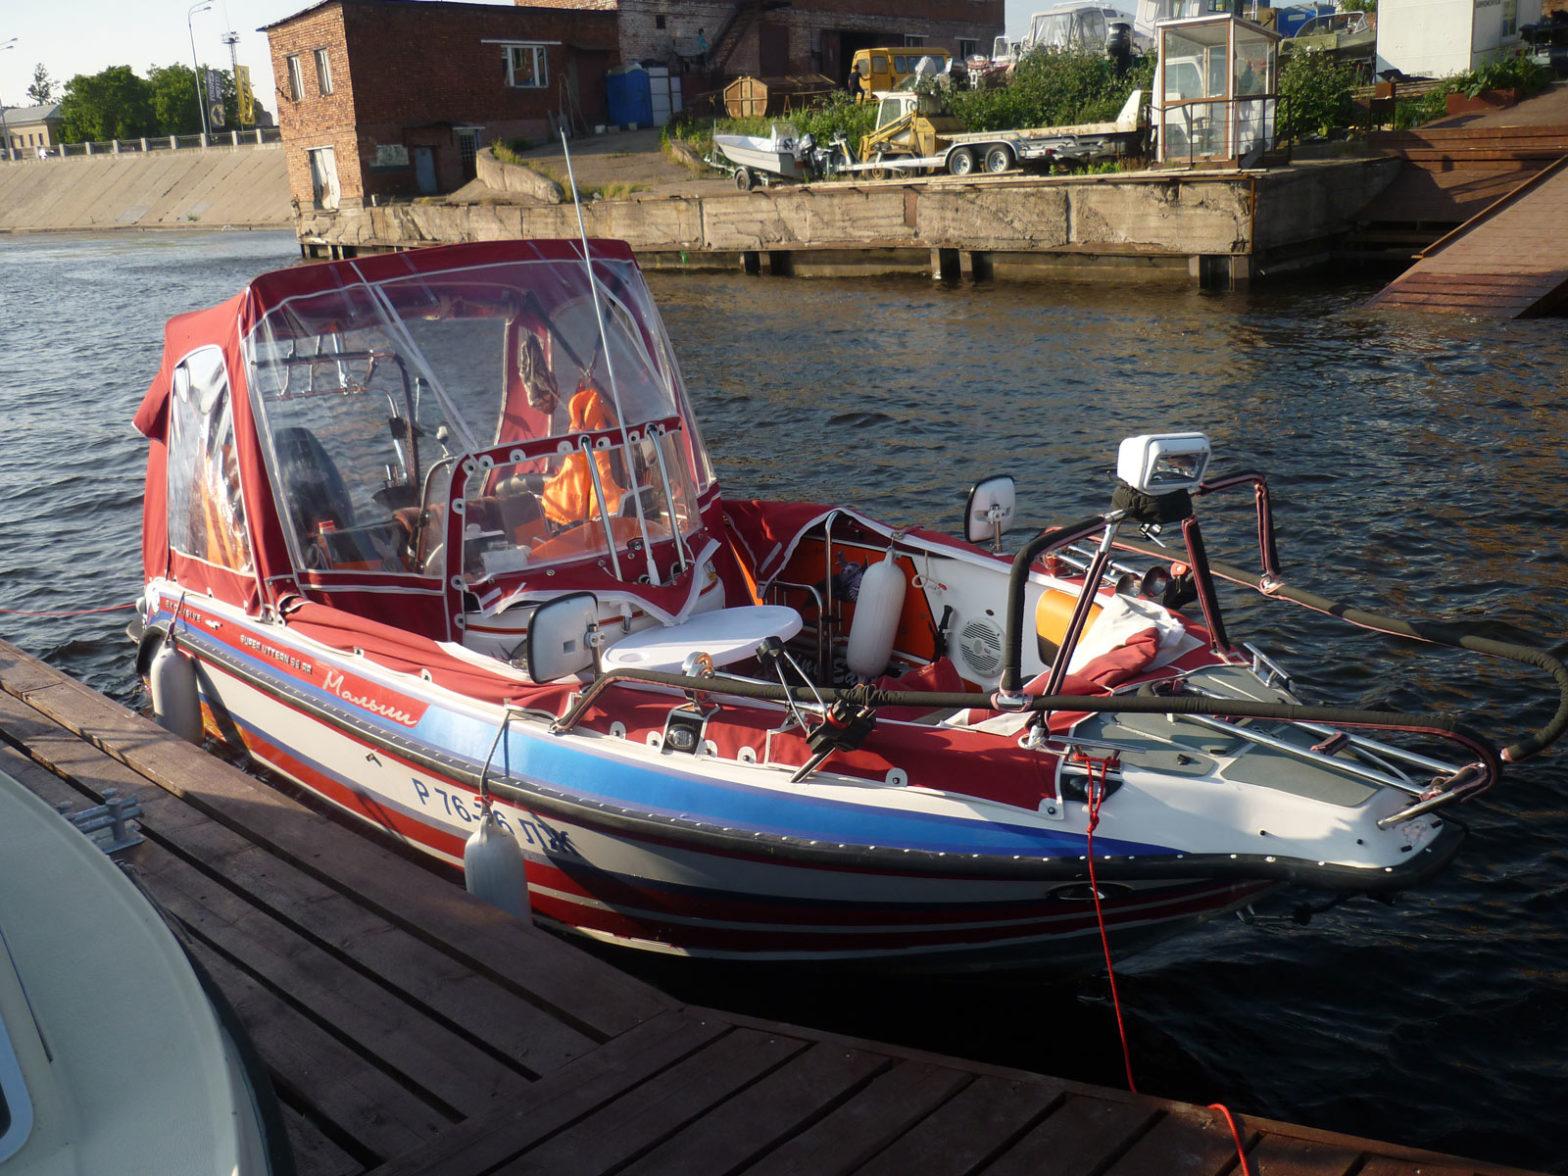 Моторная лодка GRIZZLY-580 Fisherman б/у